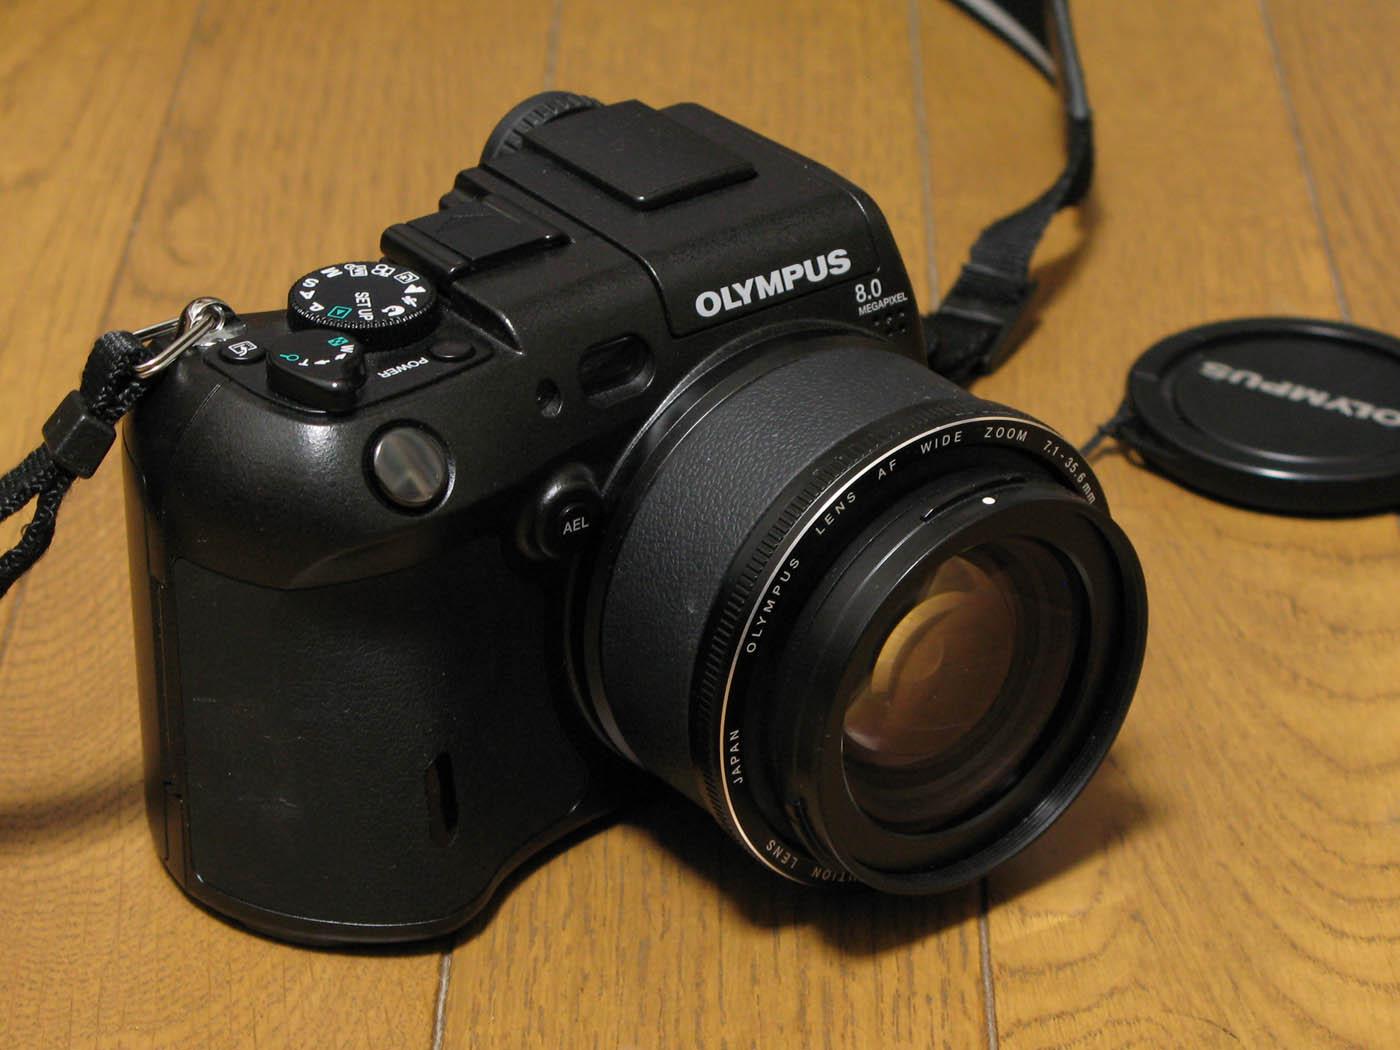 Camera Dslr Used Cameras For Sale used dslr cameras for sale japan home design related posts to japan